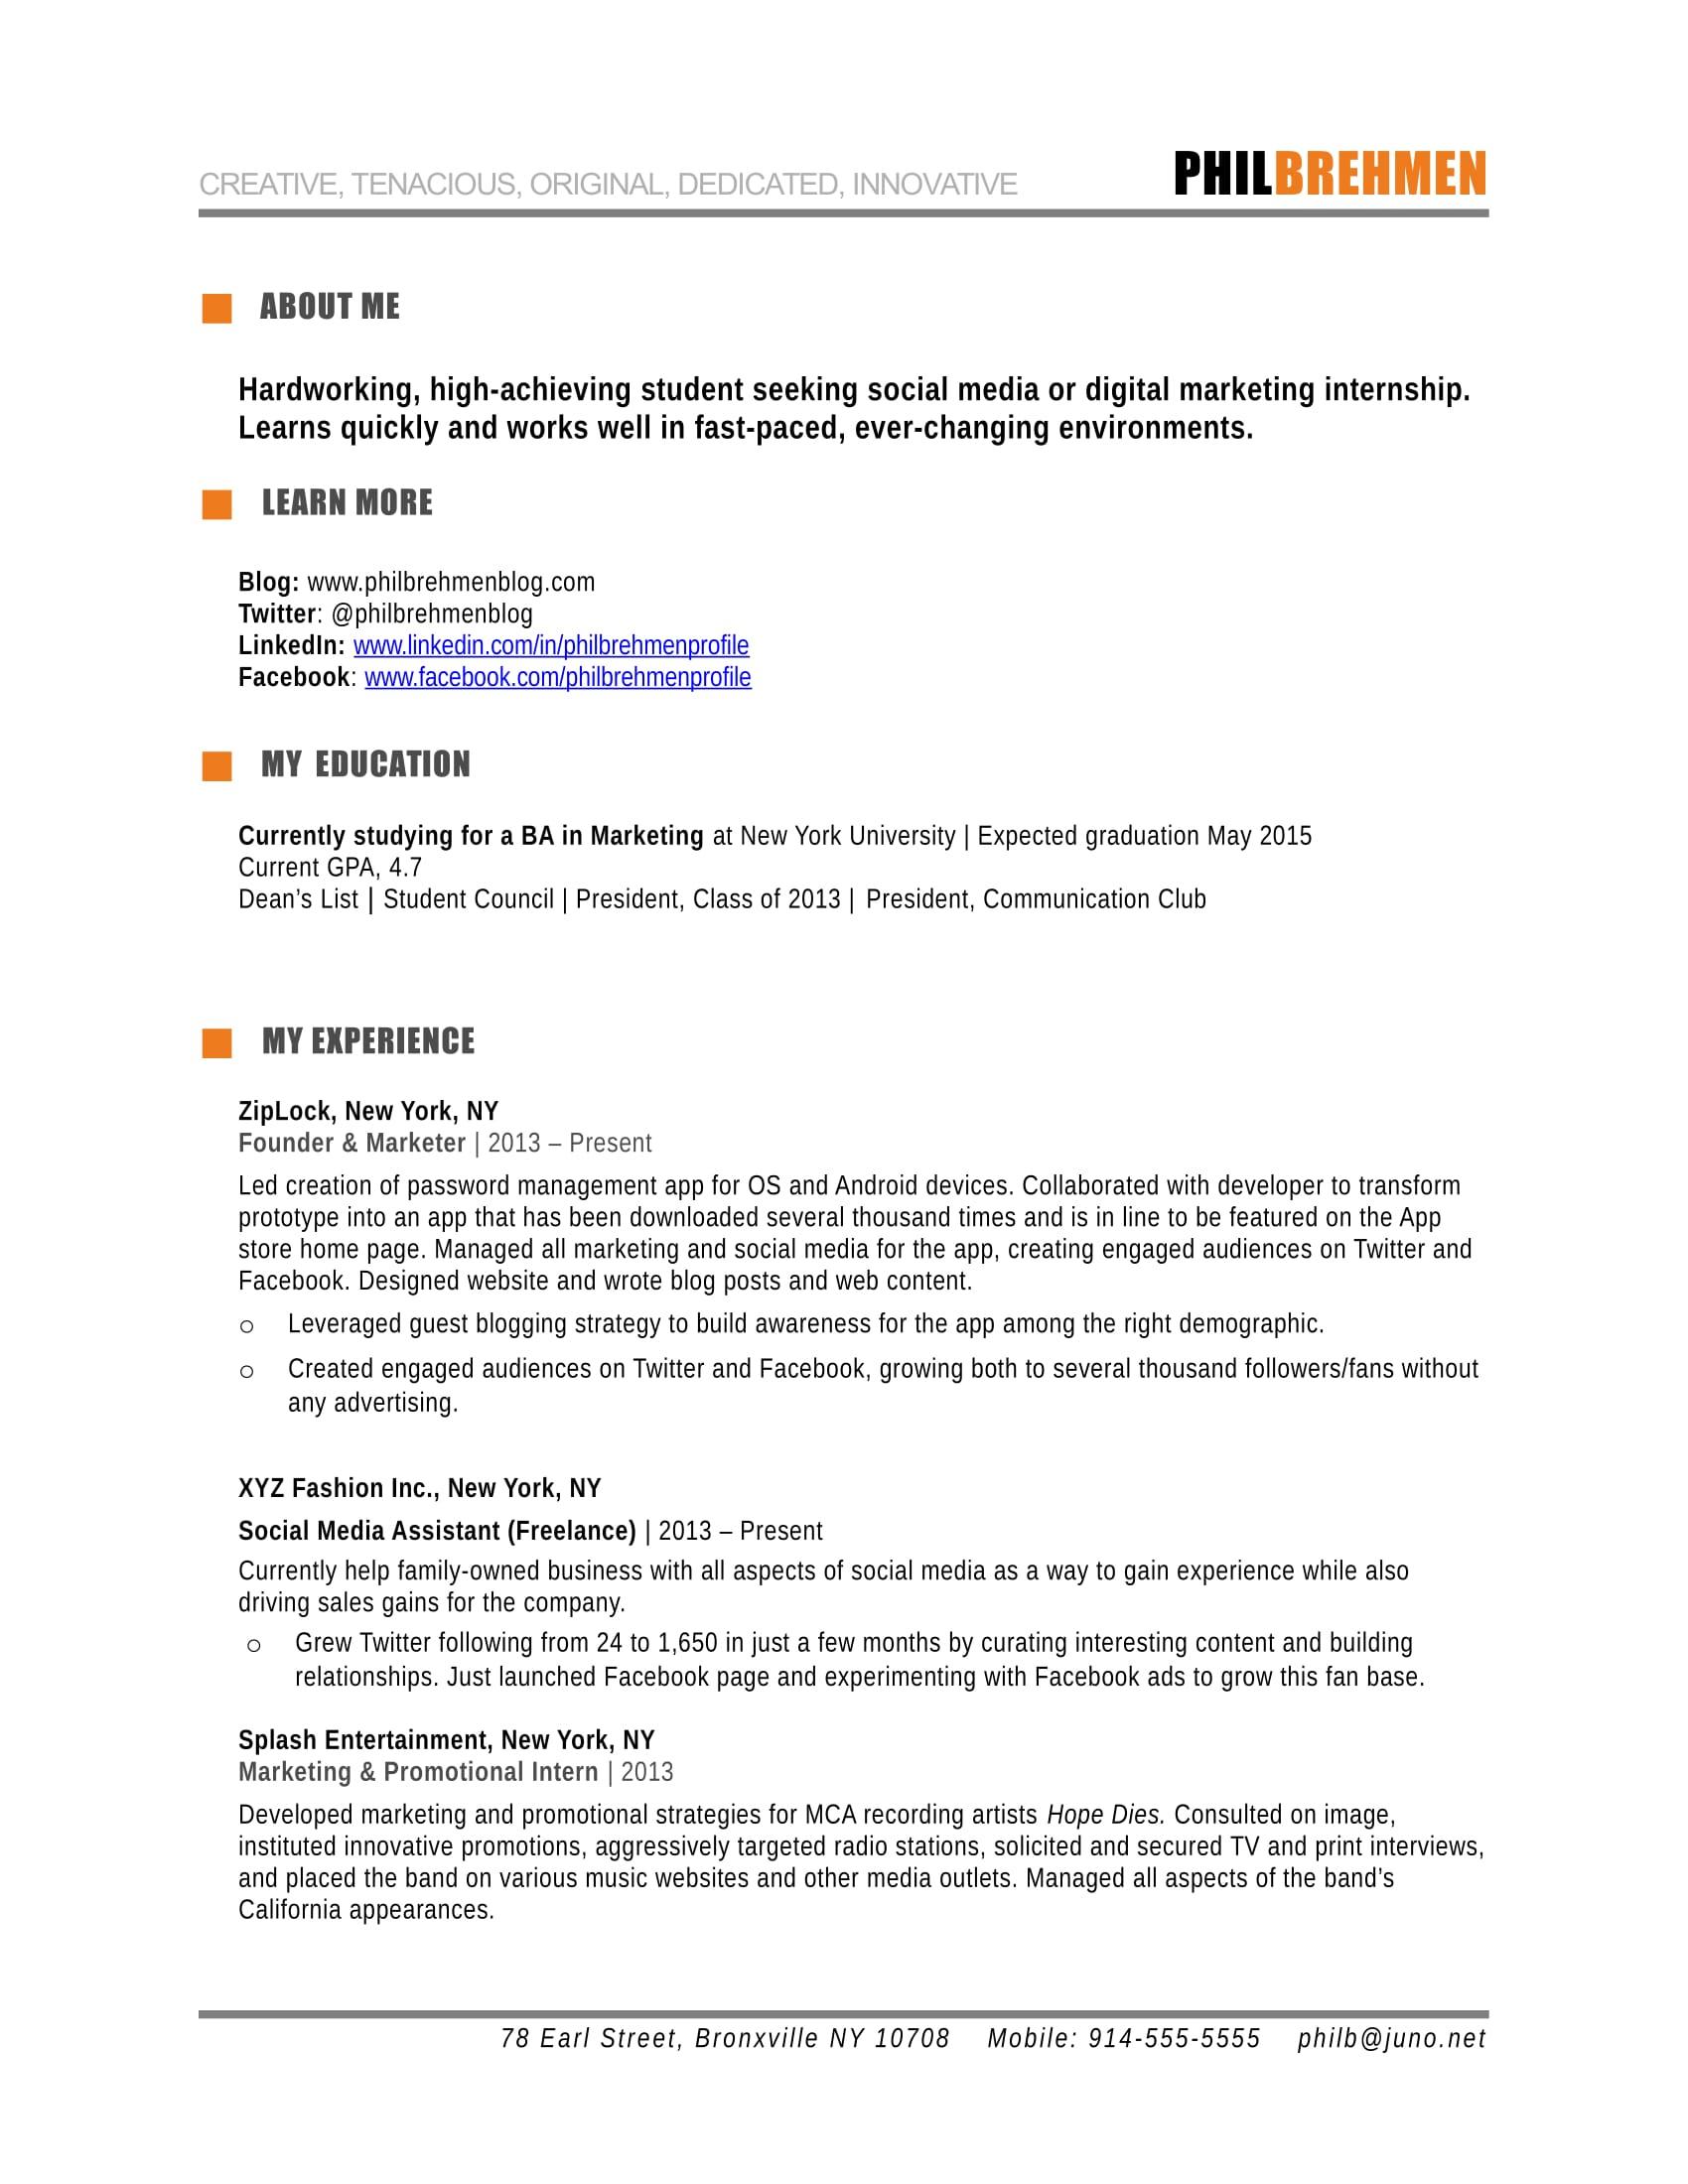 Elegant Inbound_Marketing_Intern_1 1 Inside Marketing Student Resume